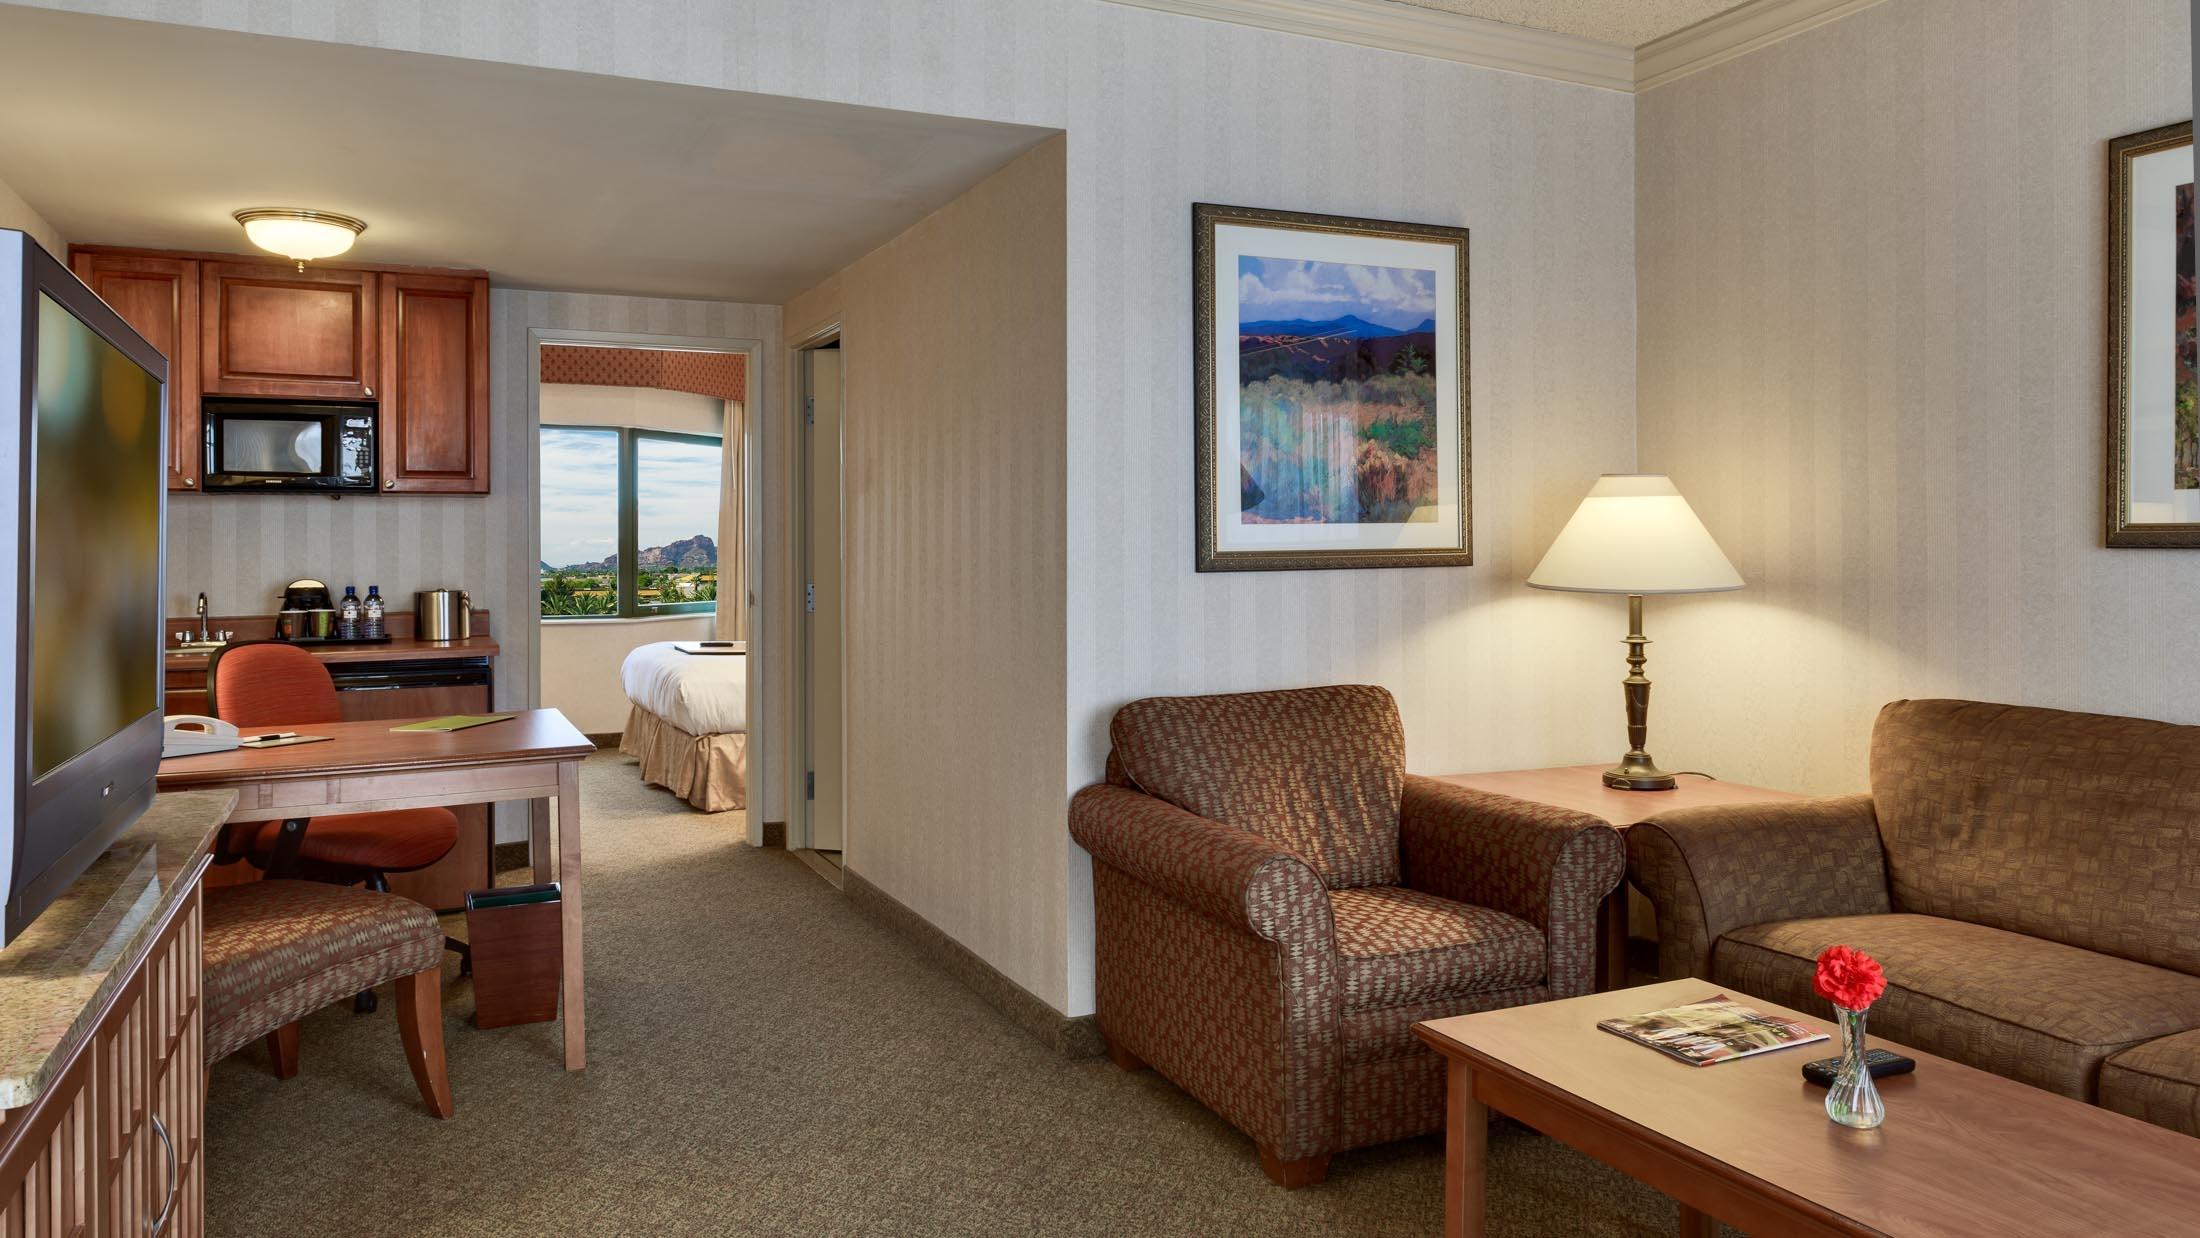 DoubleTree Suites by Hilton Hotel Phoenix image 5